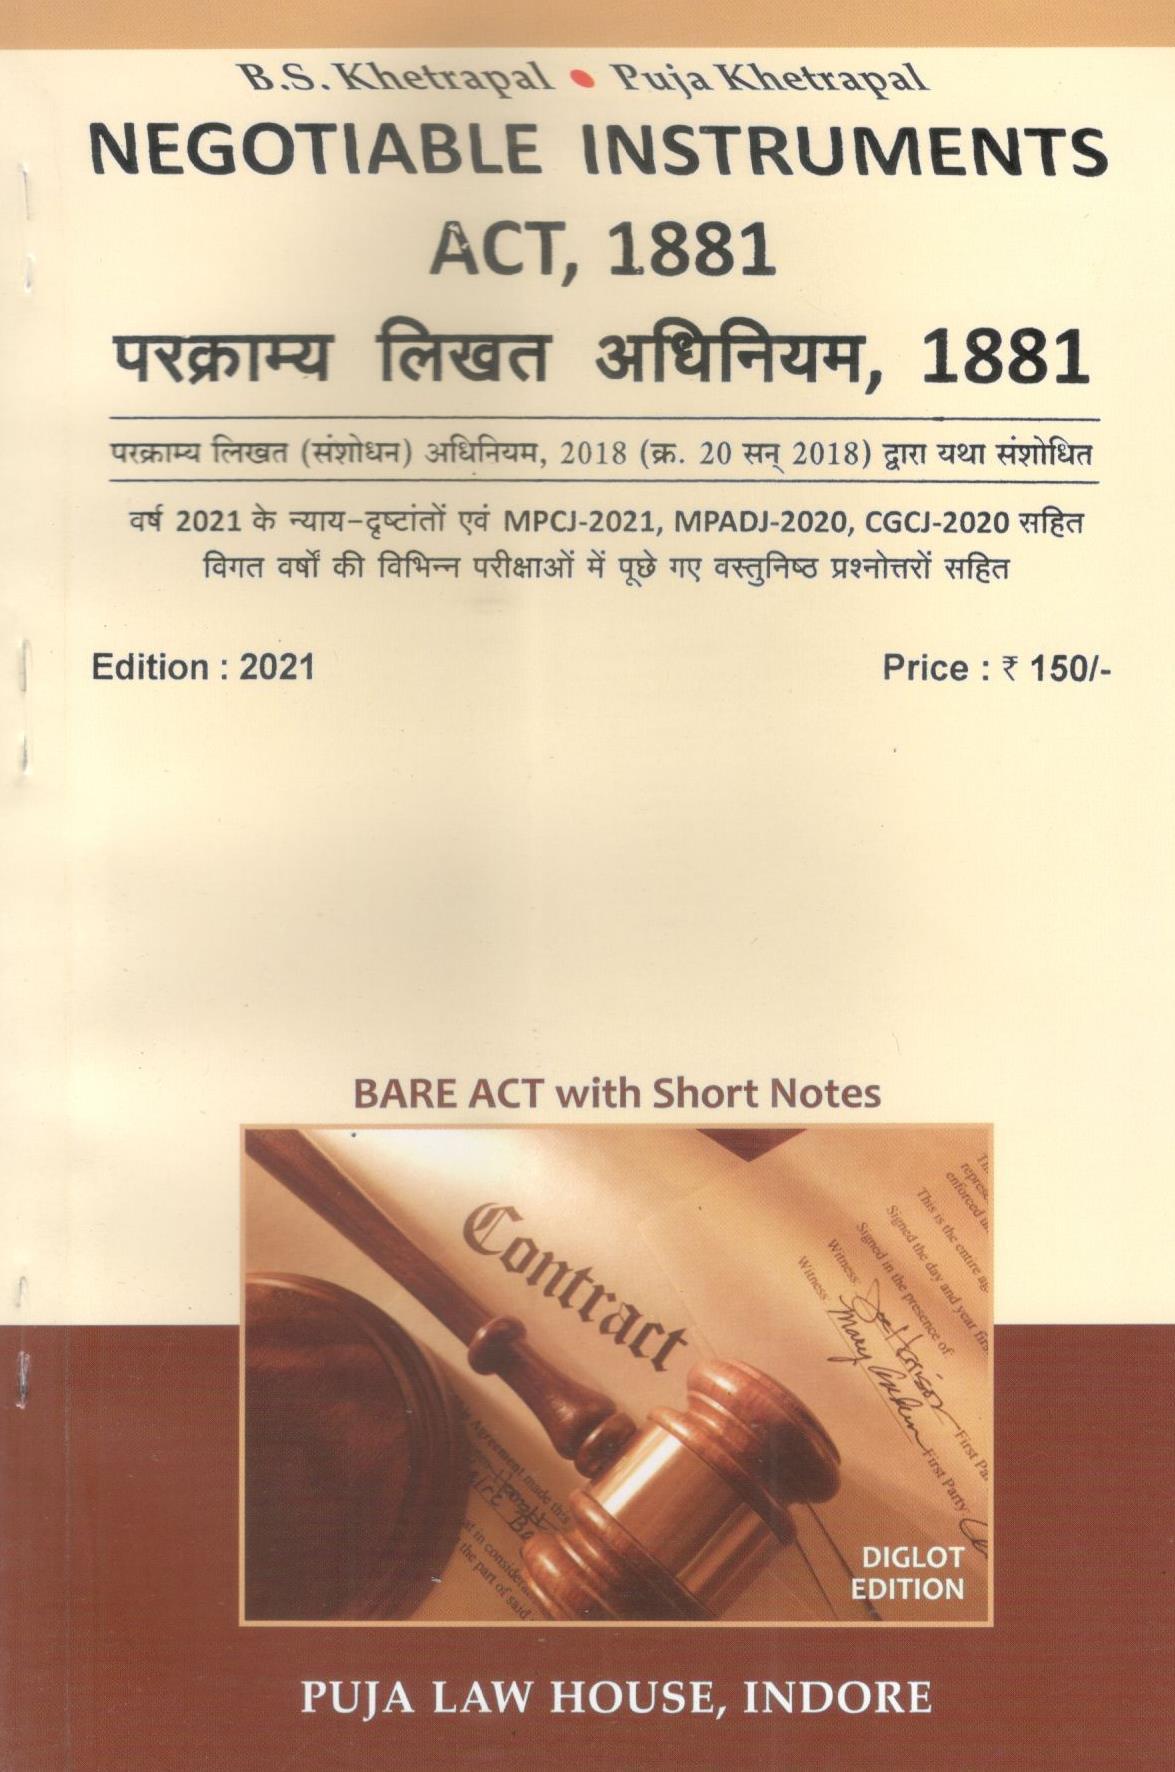 परक्राम्य लिखत अधिनियम, 1881 / Negotiable Instruments Act, 1881